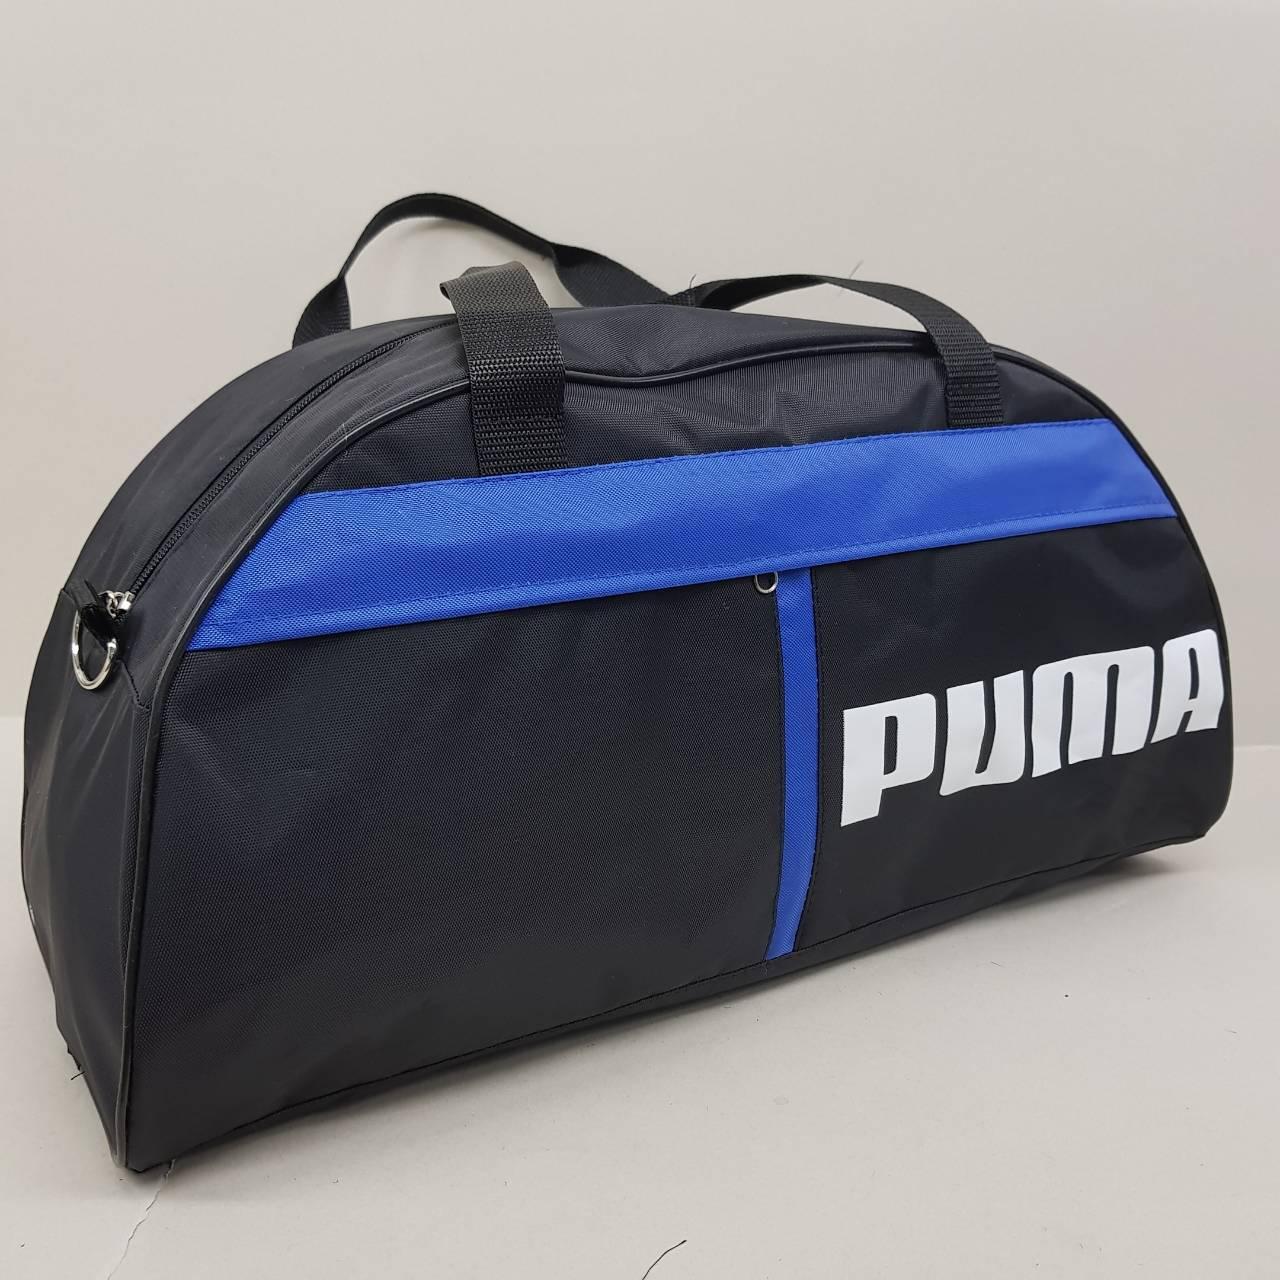 de831ea1 Сумка спортивная Пума: продажа, цена в Харькове. спортивные сумки от ...